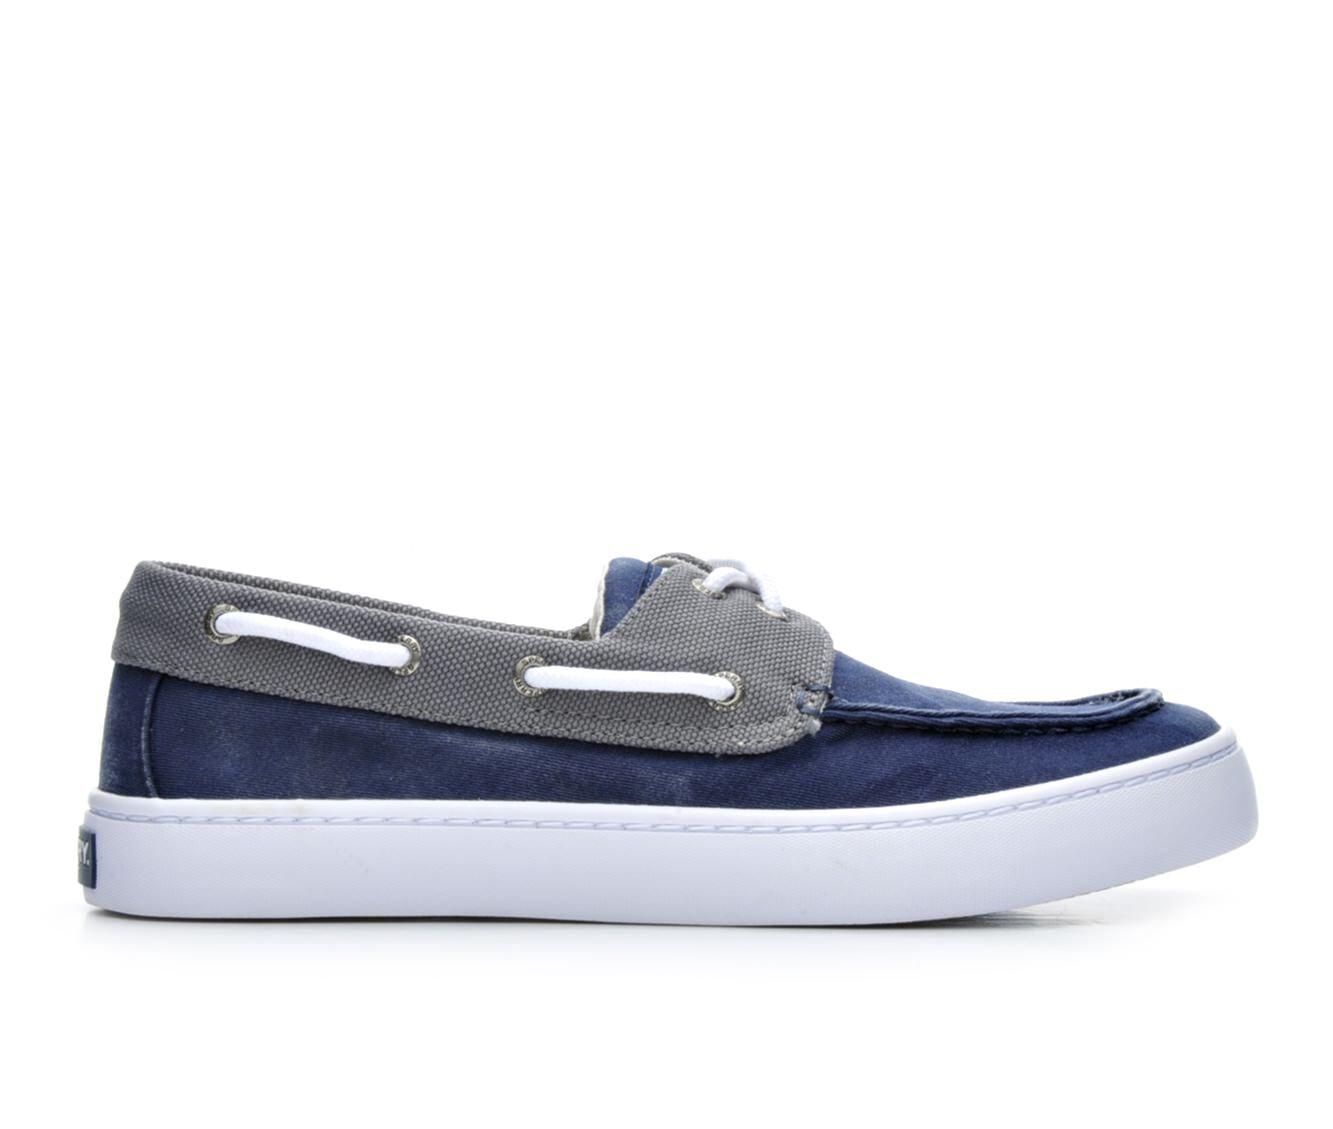 Men's Sperry Cutter 2 Eye Boat Shoes Navy/Grey